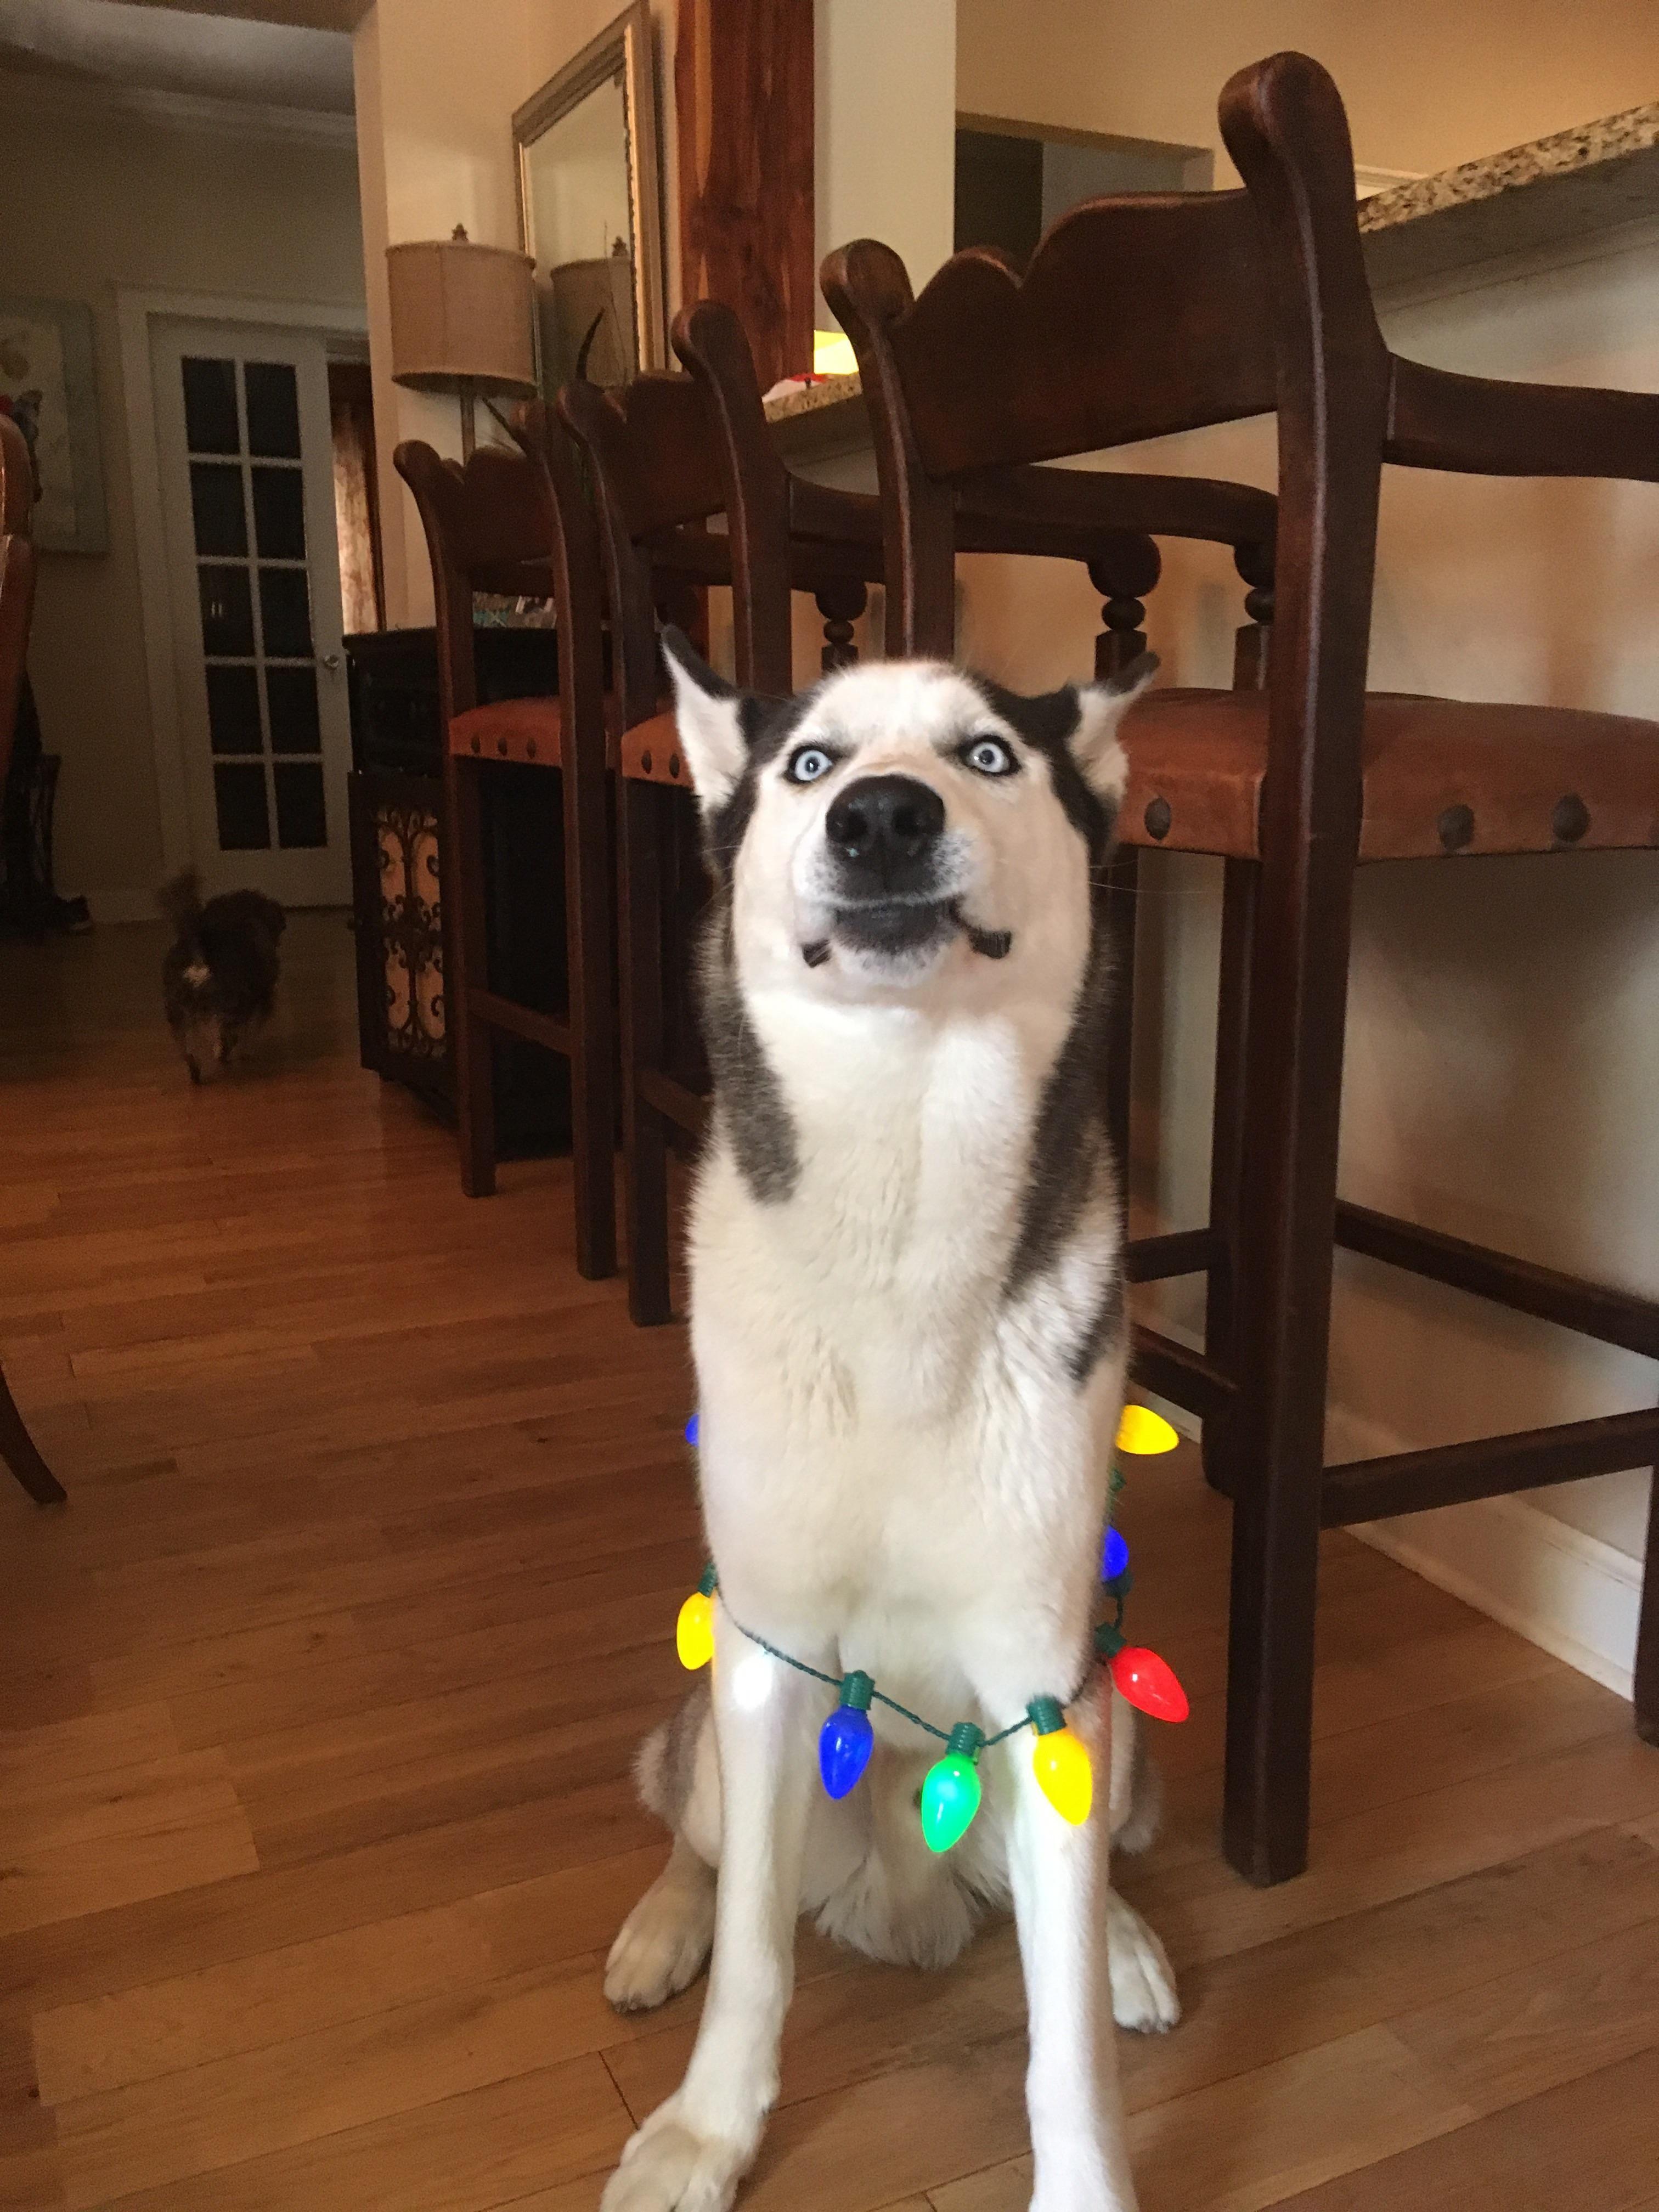 My dog pre sneeze